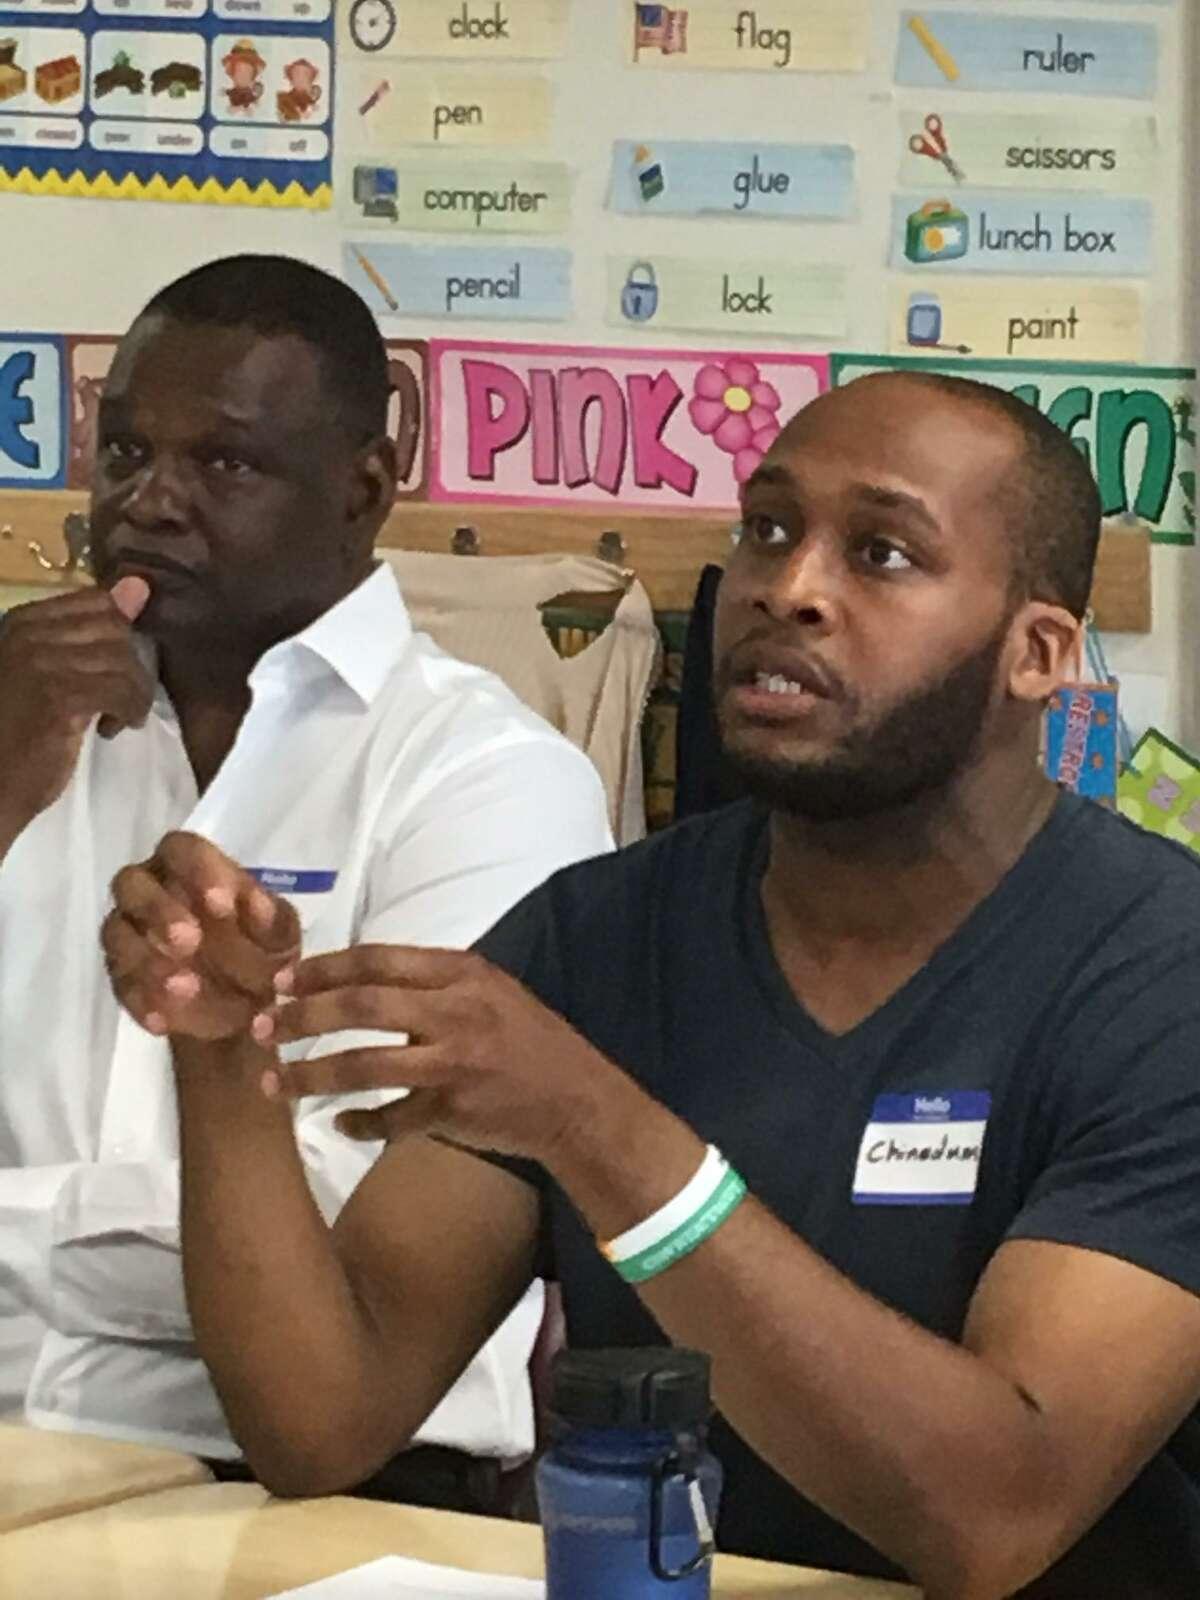 Participants in the Males of Color forum in Bridgeport in June 2018.